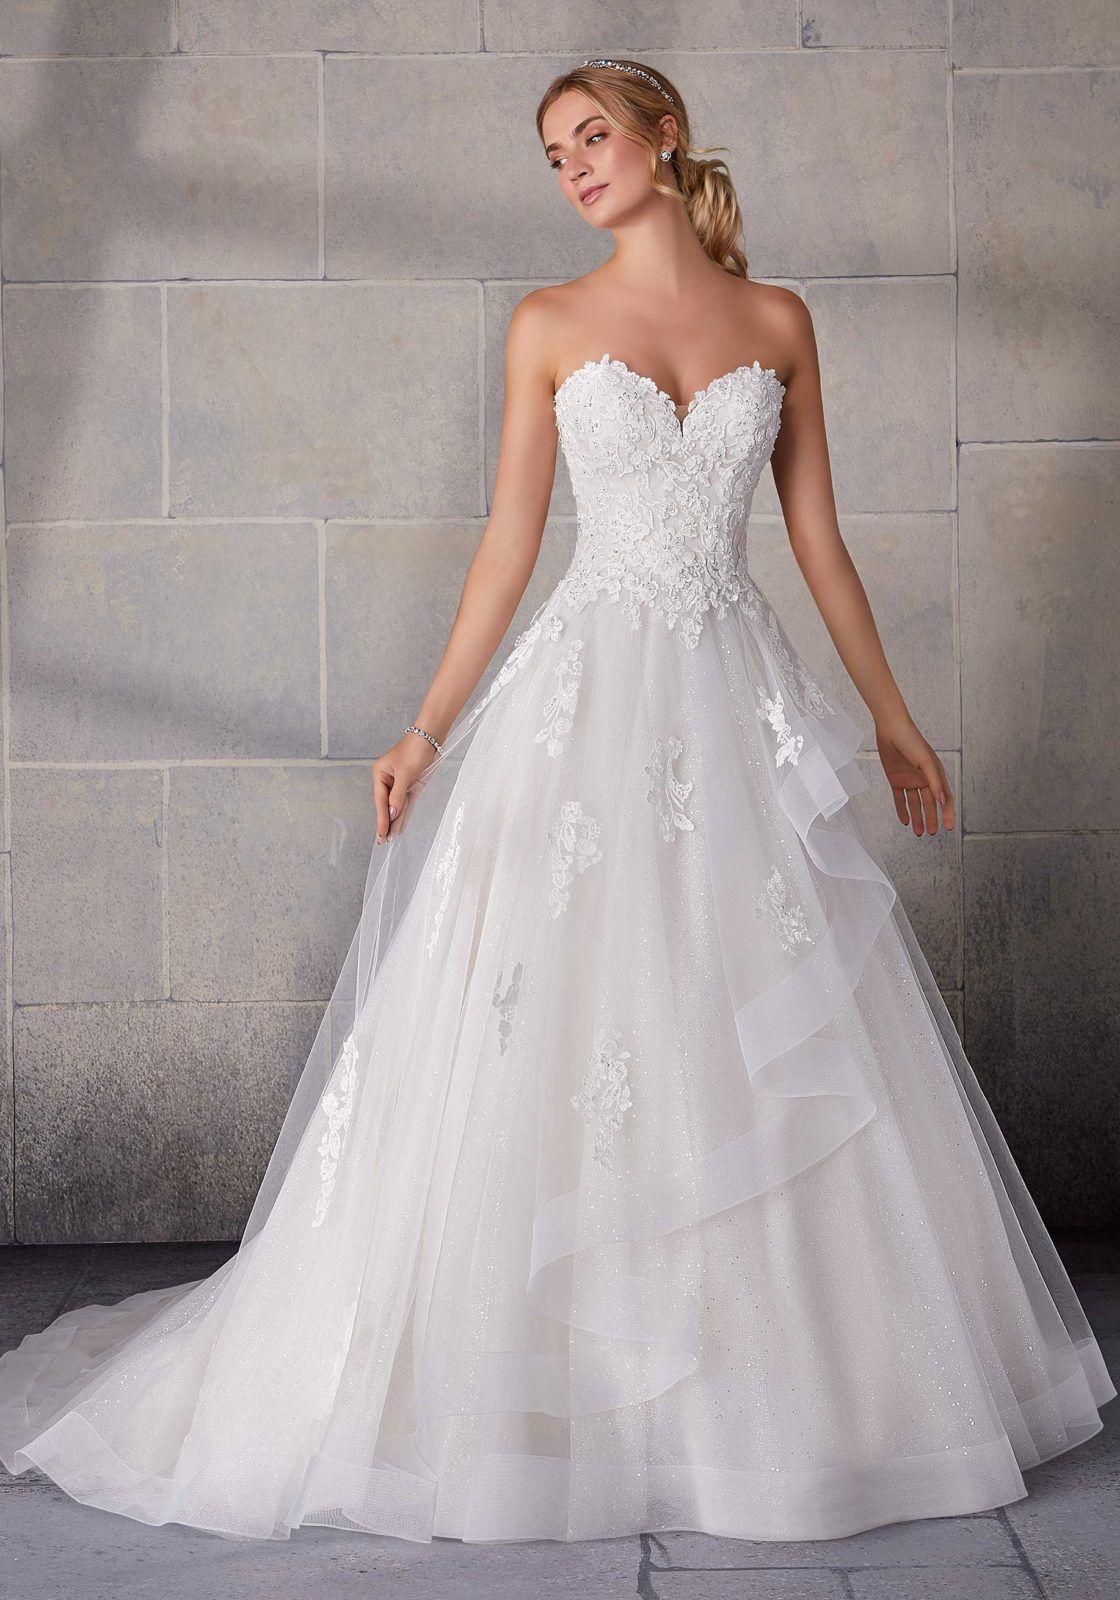 Shania Wedding Dress Morilee In 2020 A Line Wedding Dress Perfect Wedding Dress Ball Gowns Wedding